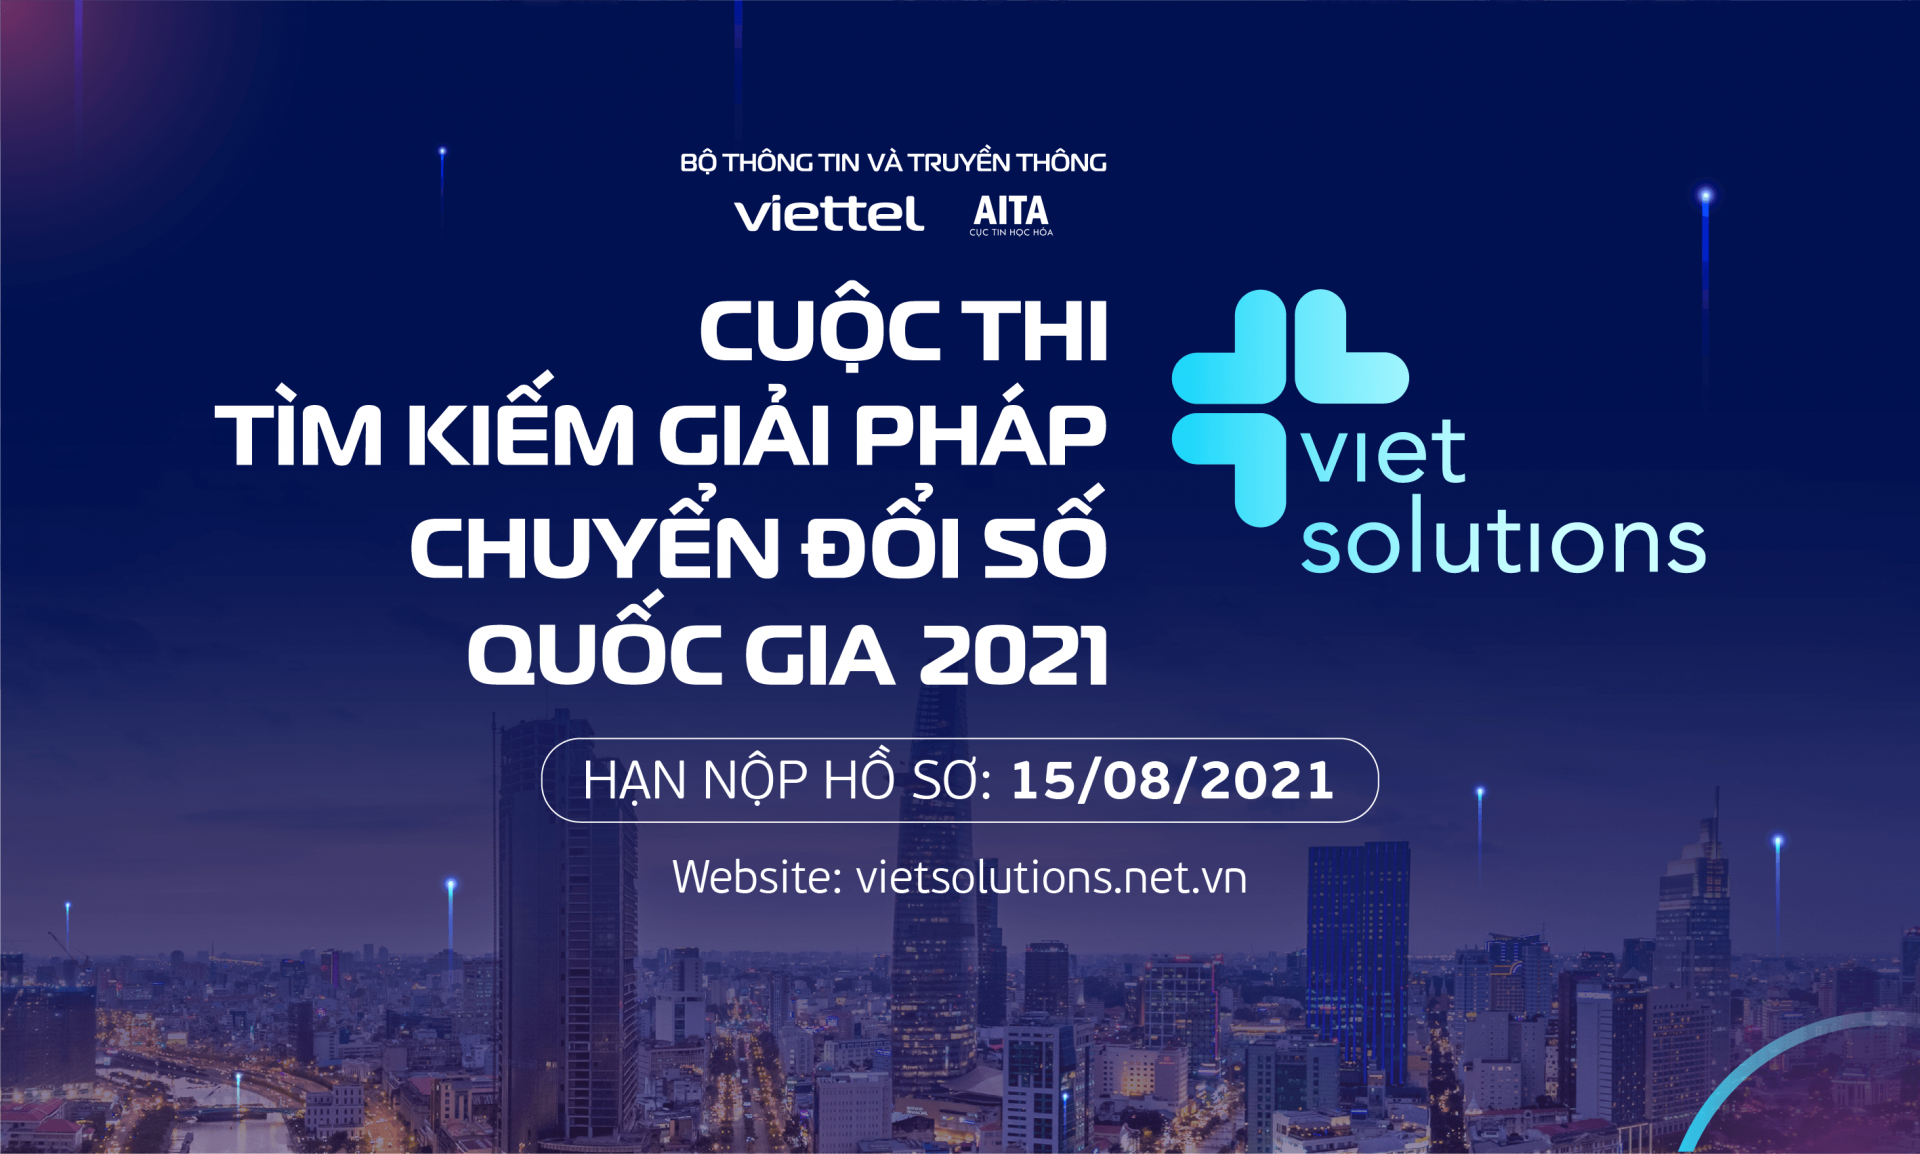 viet solutions 2021 cung cong huong de kien tao xa hoi so